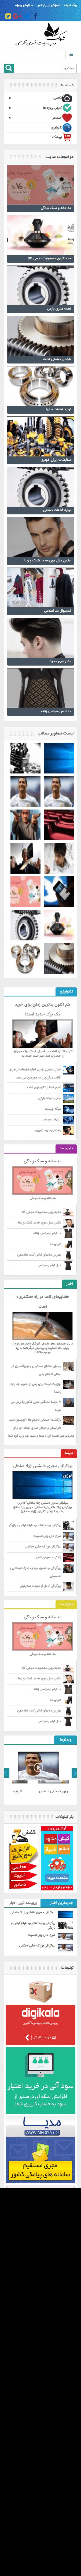 حالت موبایل سایت خبری شاپرک